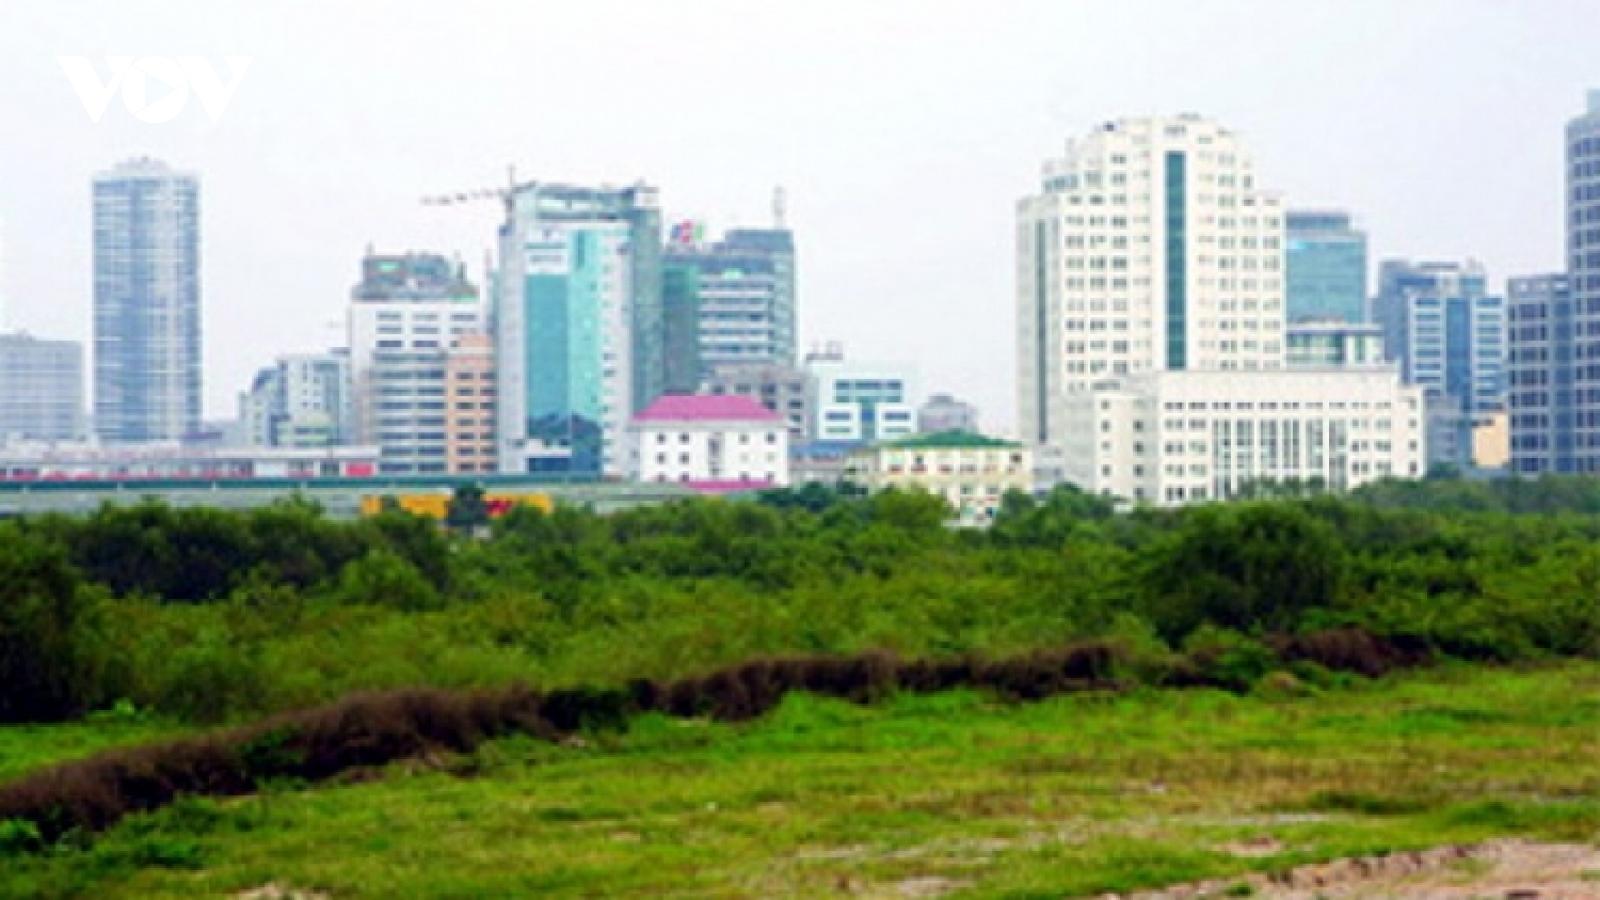 WB highlights comprehensive Vietnamese policy framework in land management